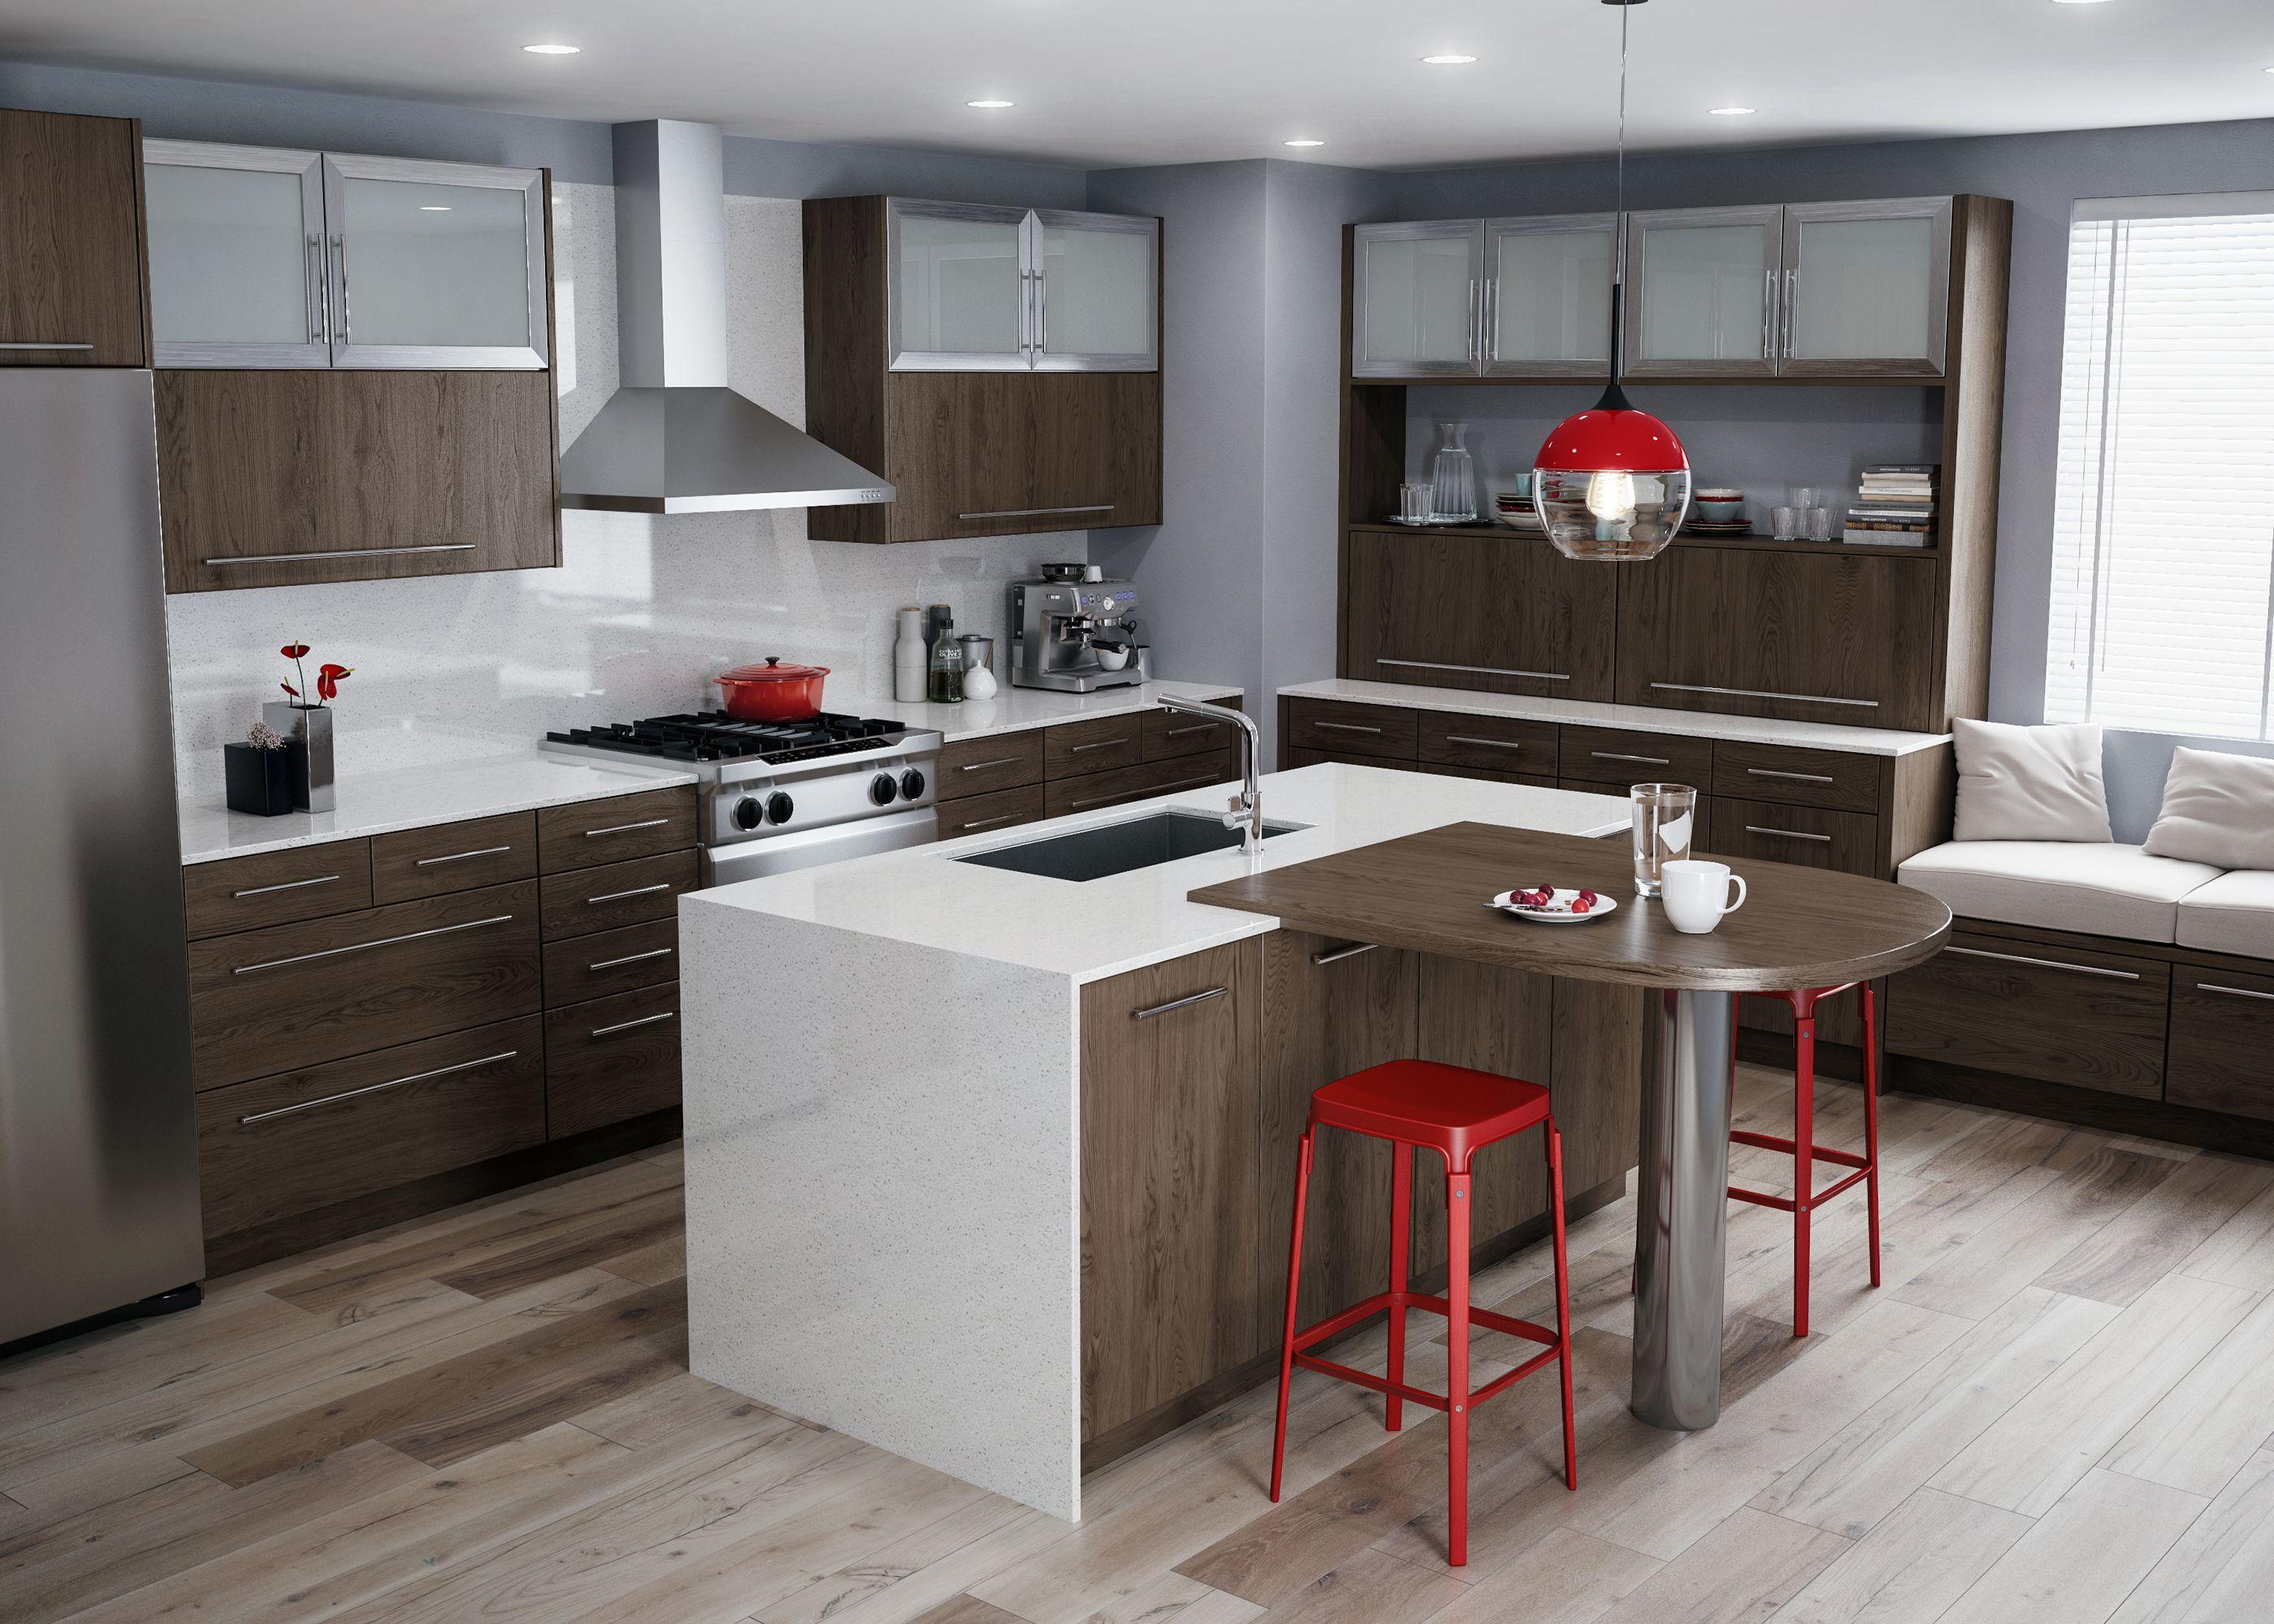 nevada reno apartments cabinets south latitude kitchen cabinet harvest nv lmc view more